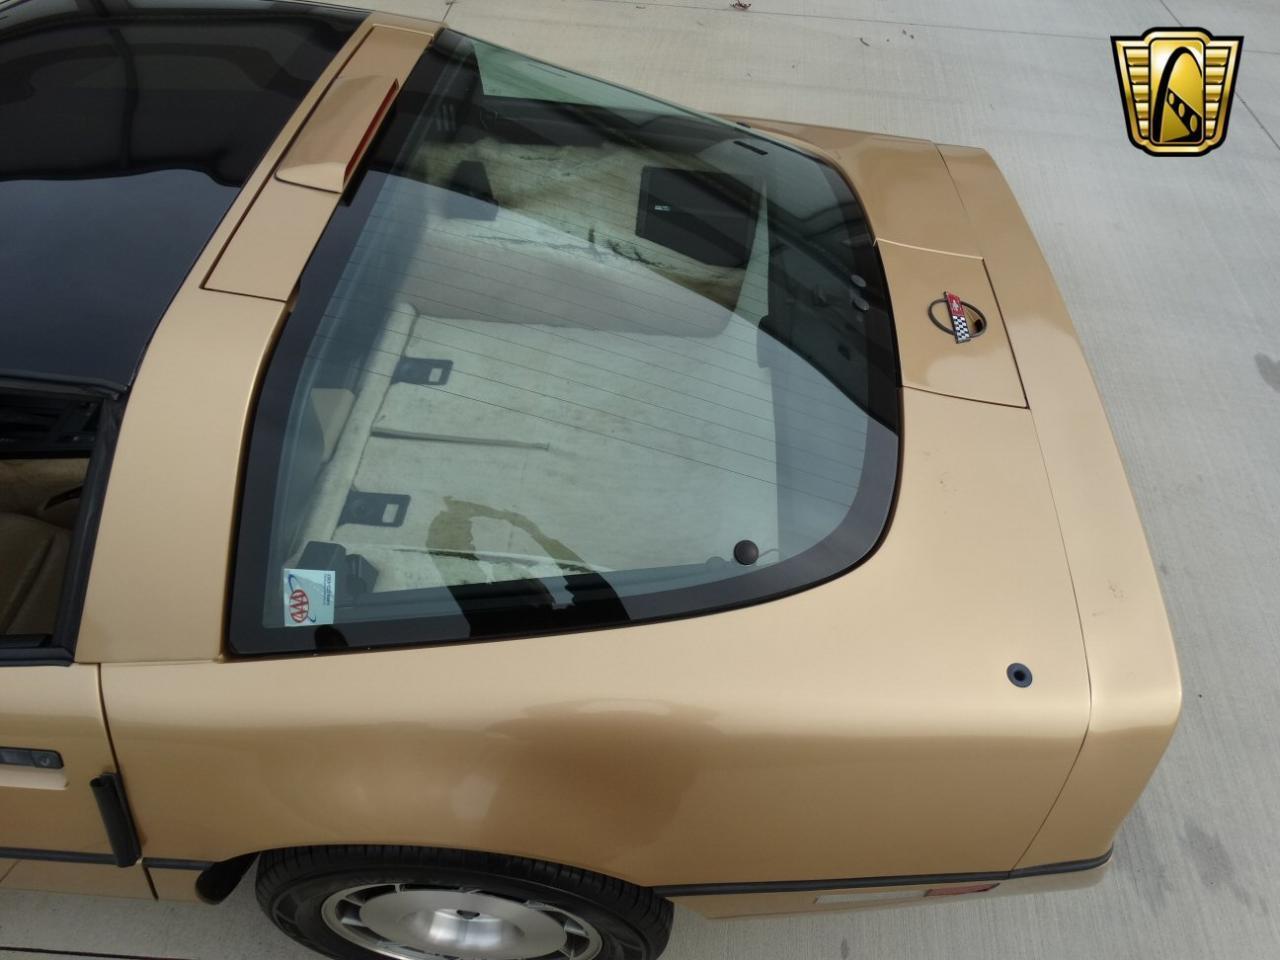 Large Picture of '86 Corvette located in Alpharetta Georgia - $11,595.00 Offered by Gateway Classic Cars - Atlanta - KF5W